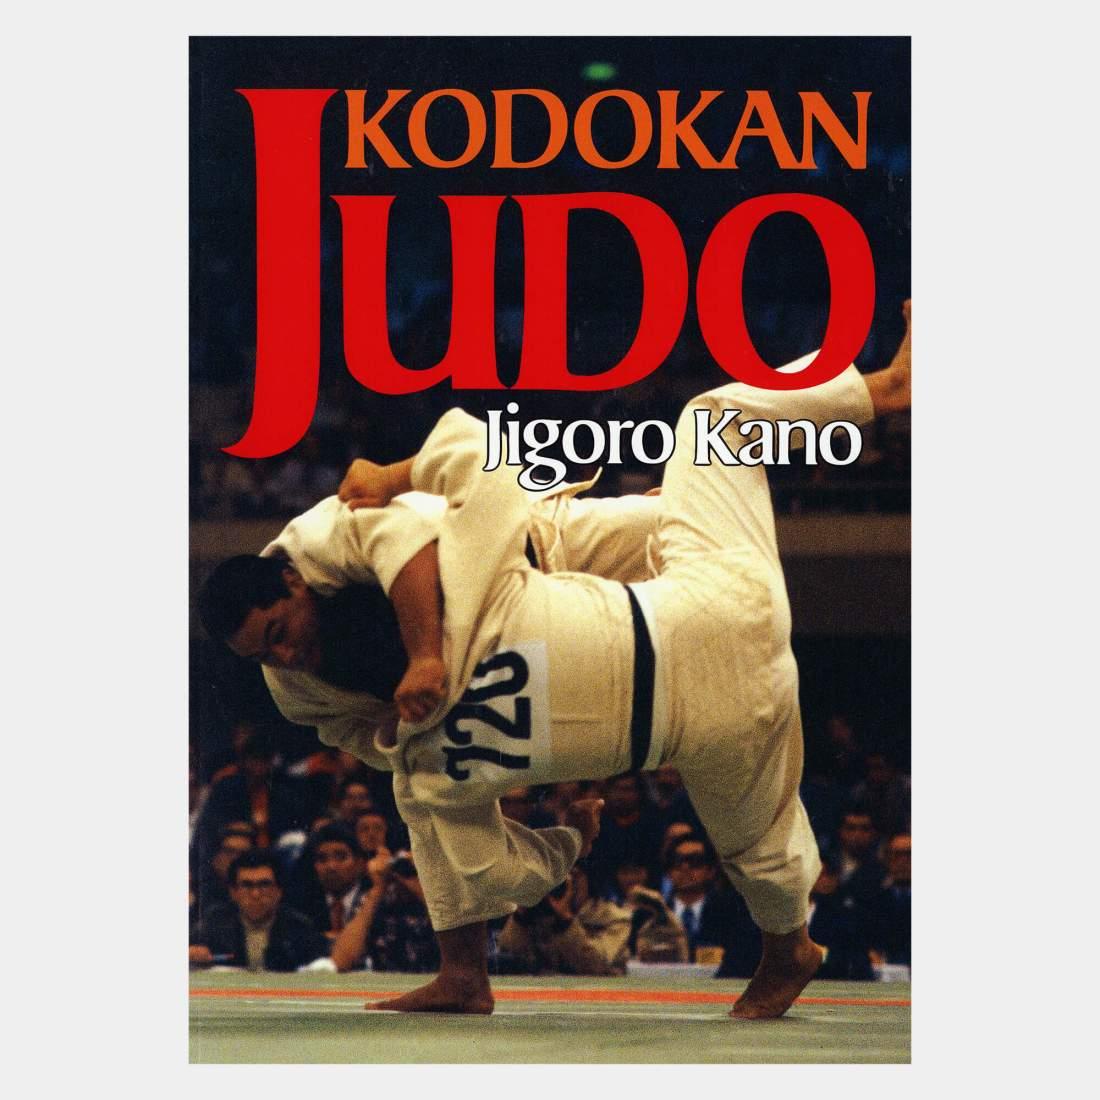 Libro Kodokan judo Jigoro kano